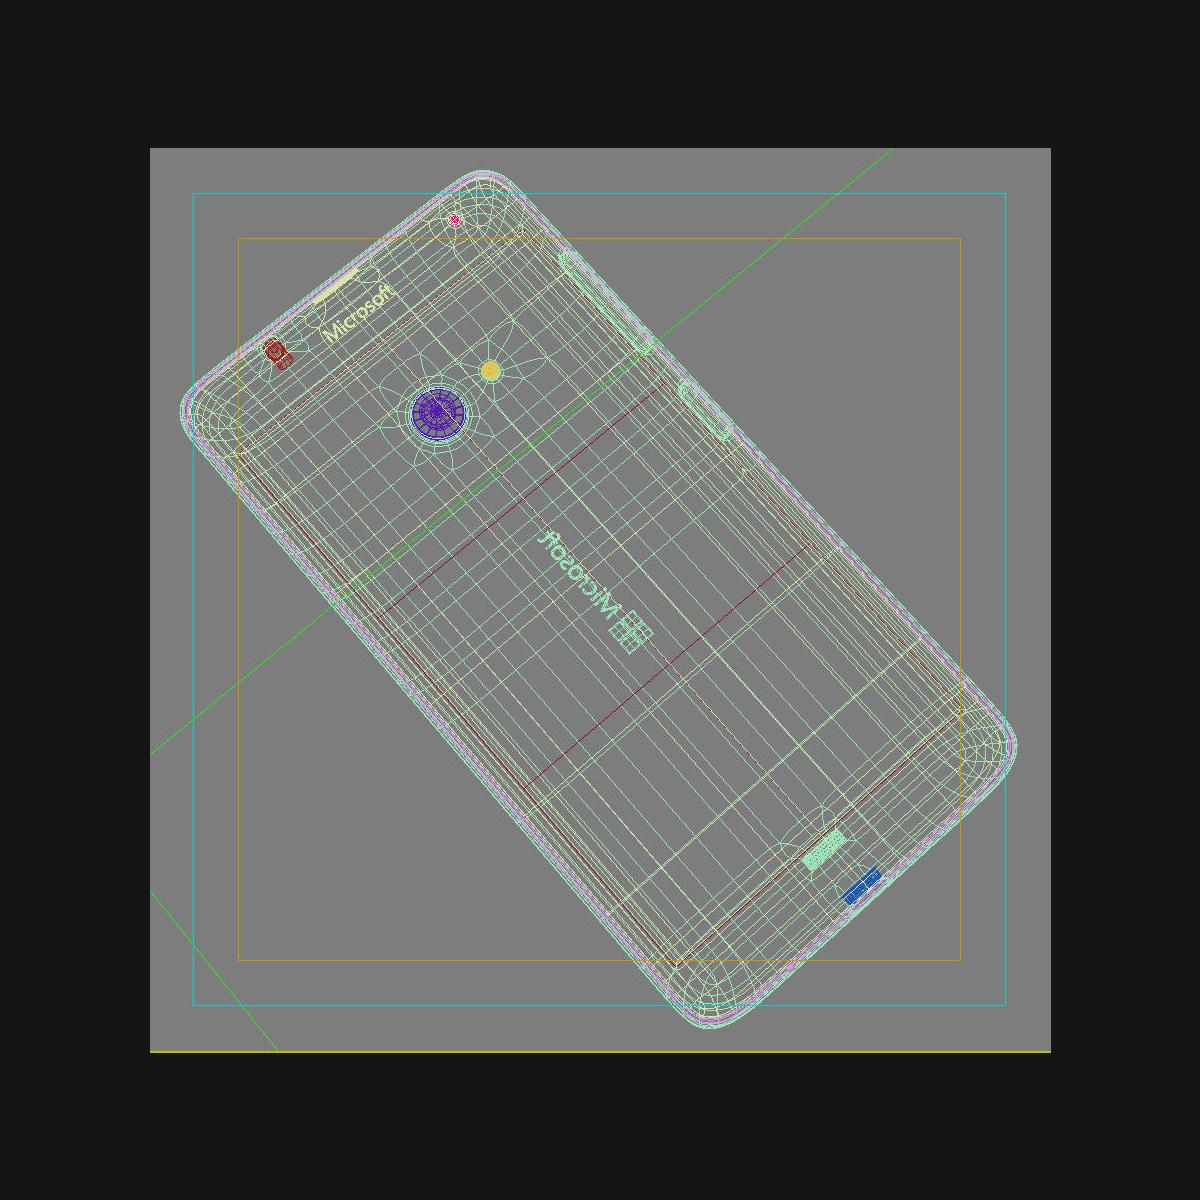 microsoft lumia 535 and dual sim white 3d model 3ds max fbx c4d obj 204303